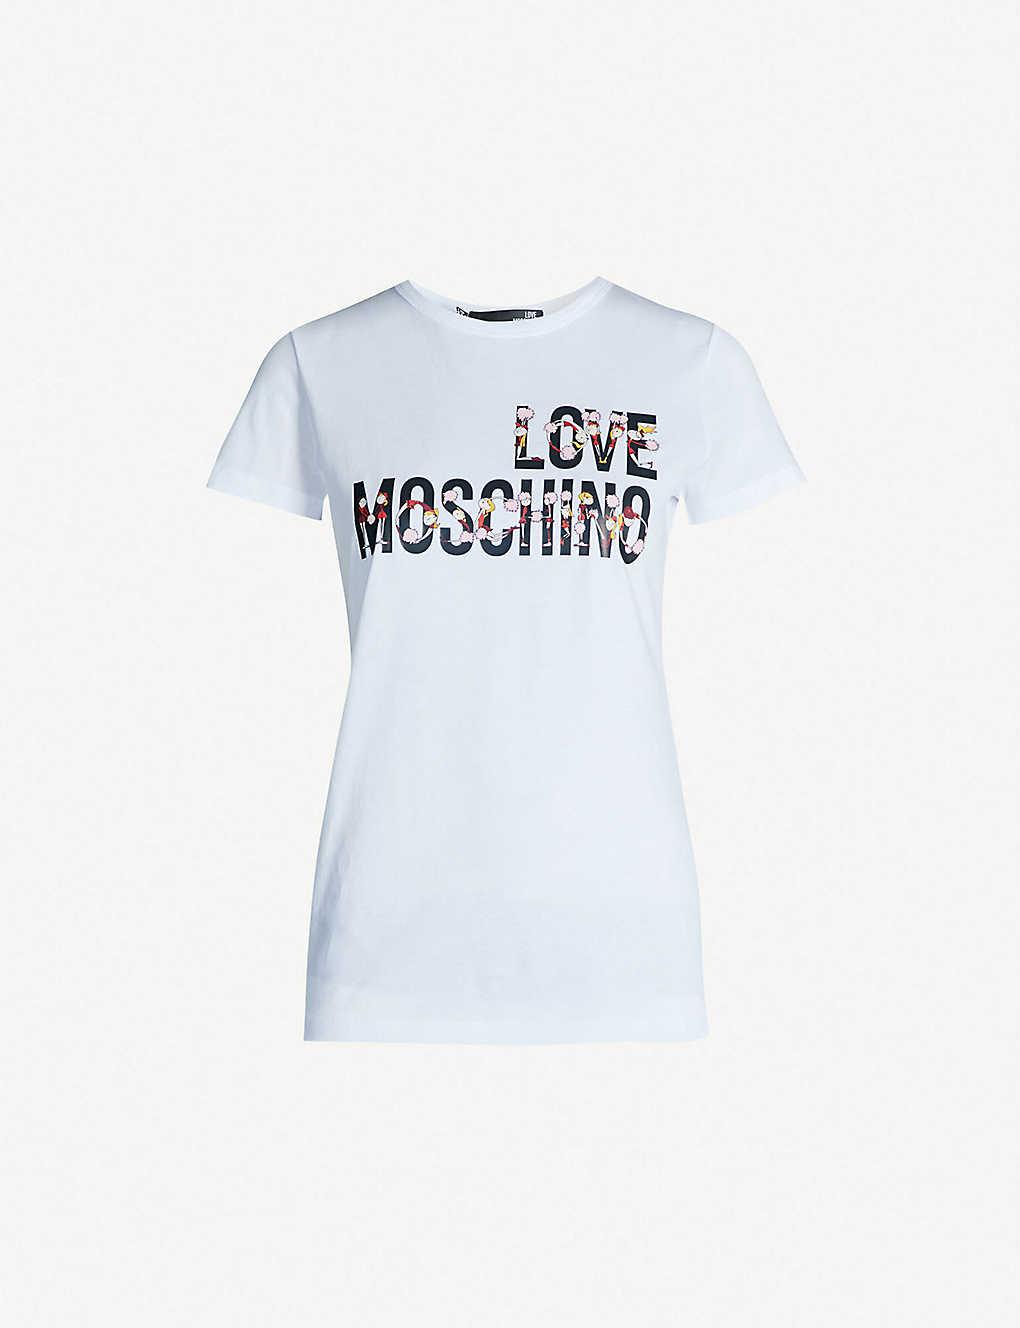 9ee4cc32e1218 LOVE MOSCHINO - Cheerleader logo-print cotton-jersey T-shirt ...